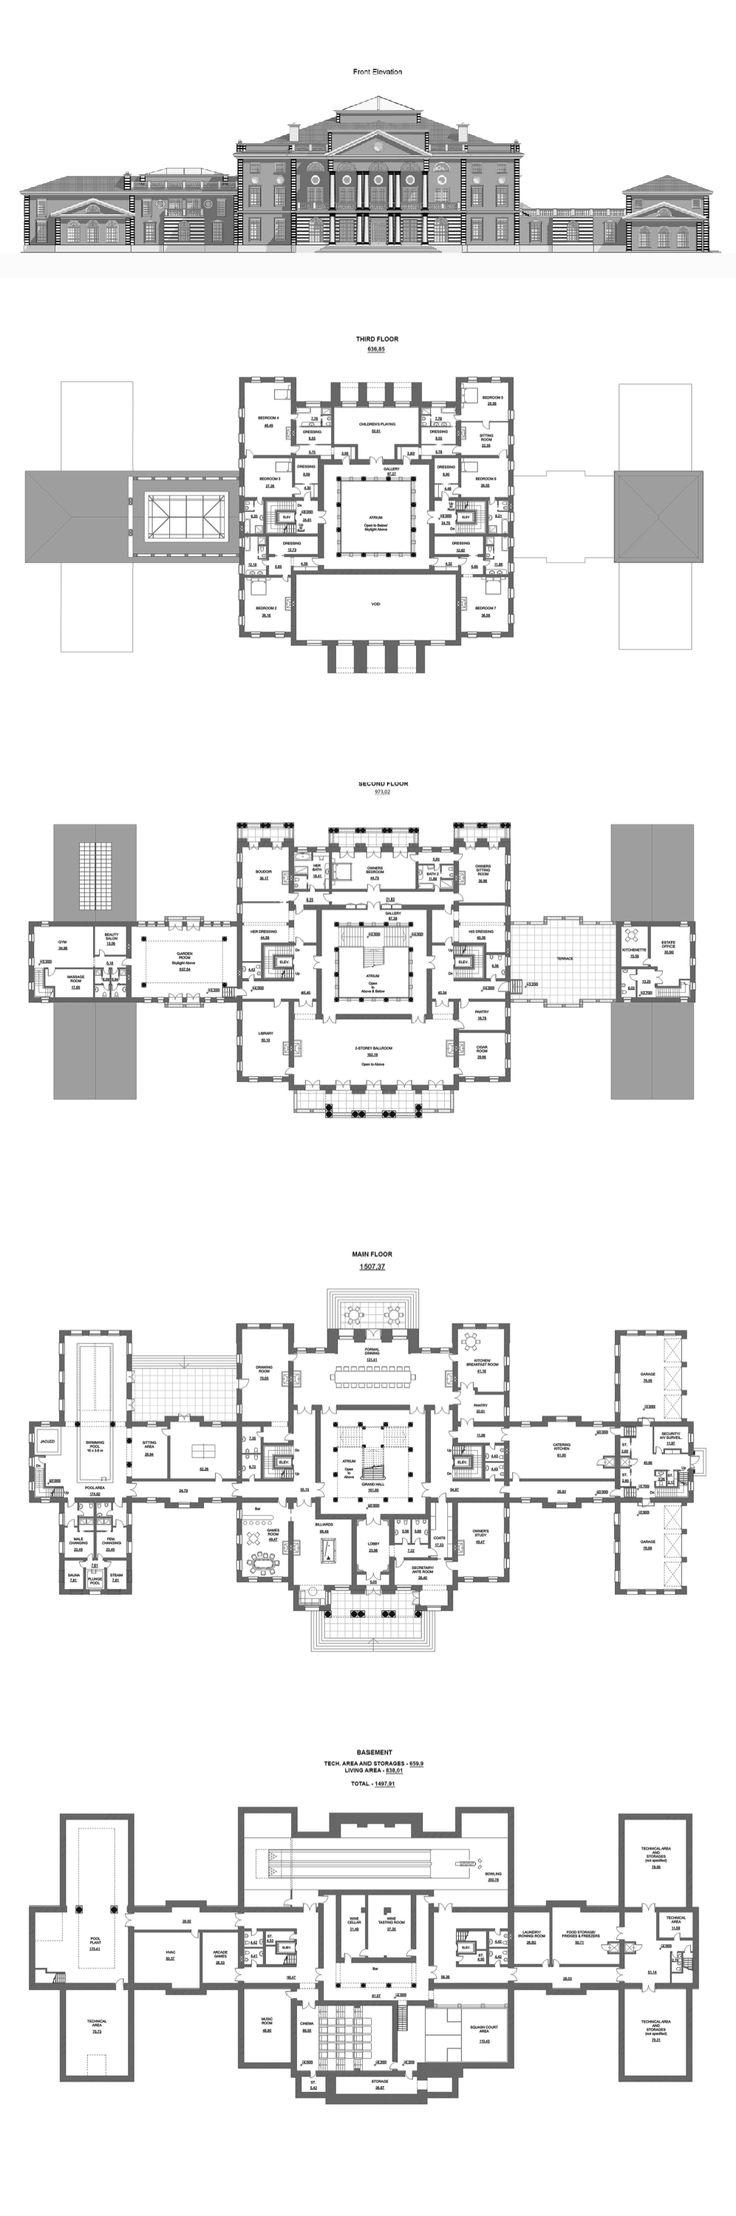 A HOTR Reader's 50,000 Square Foot Mega Mansion Design